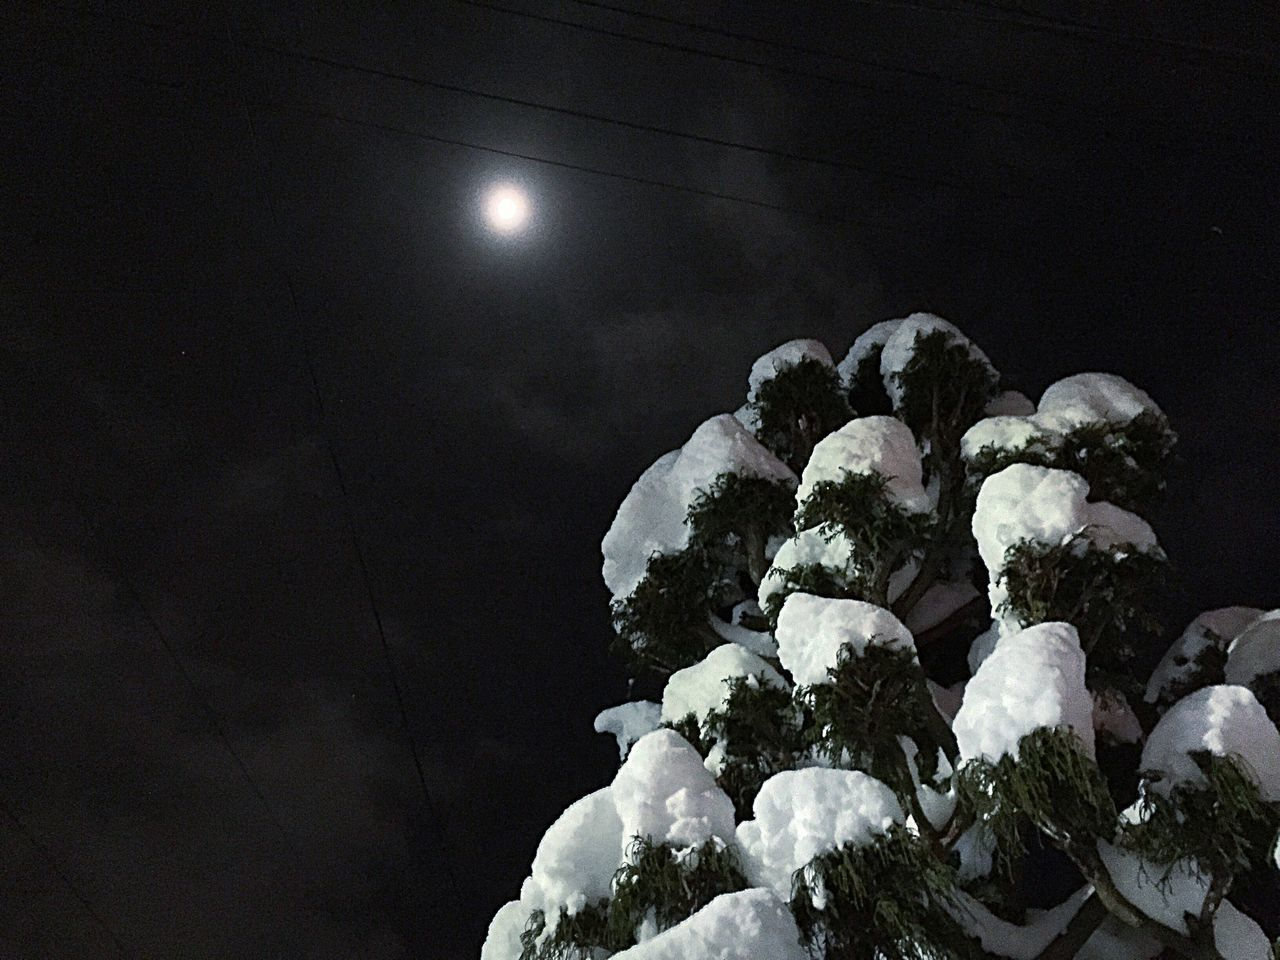 Snow Snow ❄ Snow Trees Snowing Nightphotography Moon